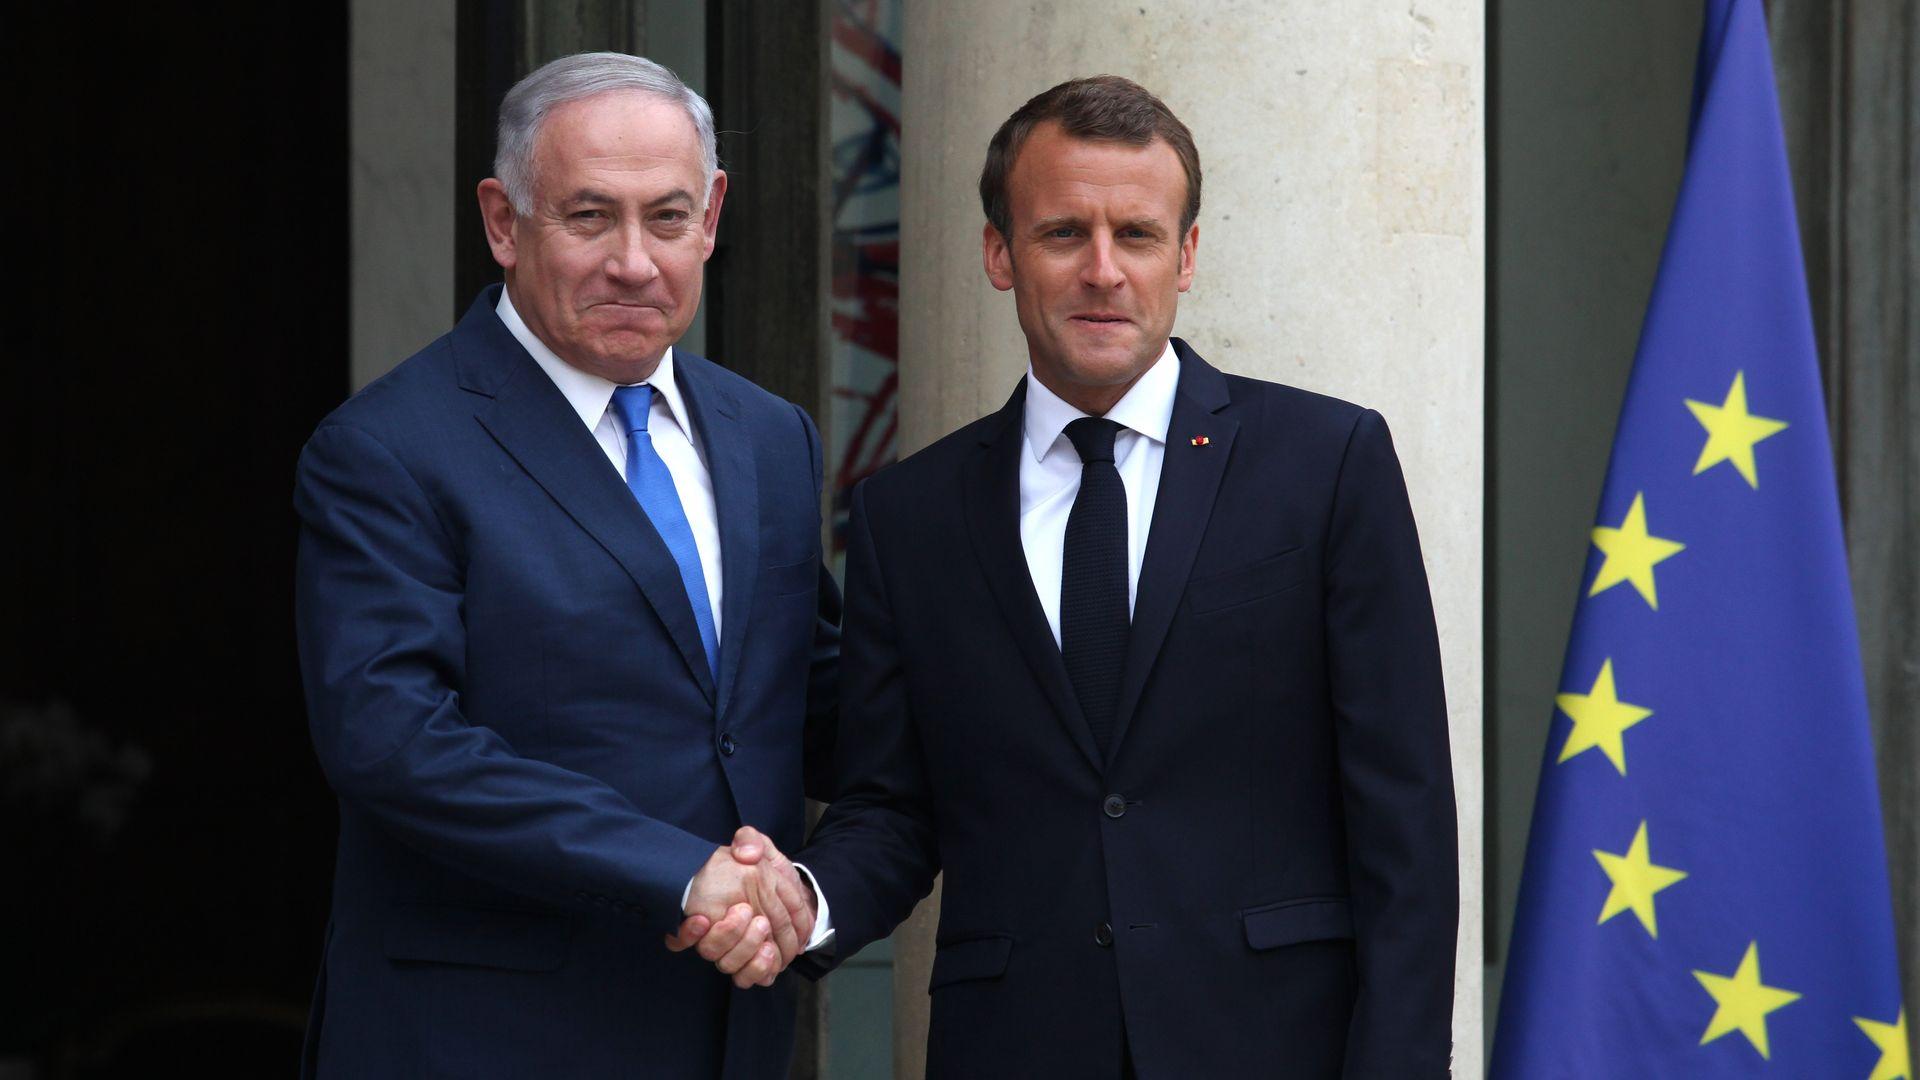 Israeli prime minister Benjamin Netanyahu shakes hands with French president Emmanuel Macron